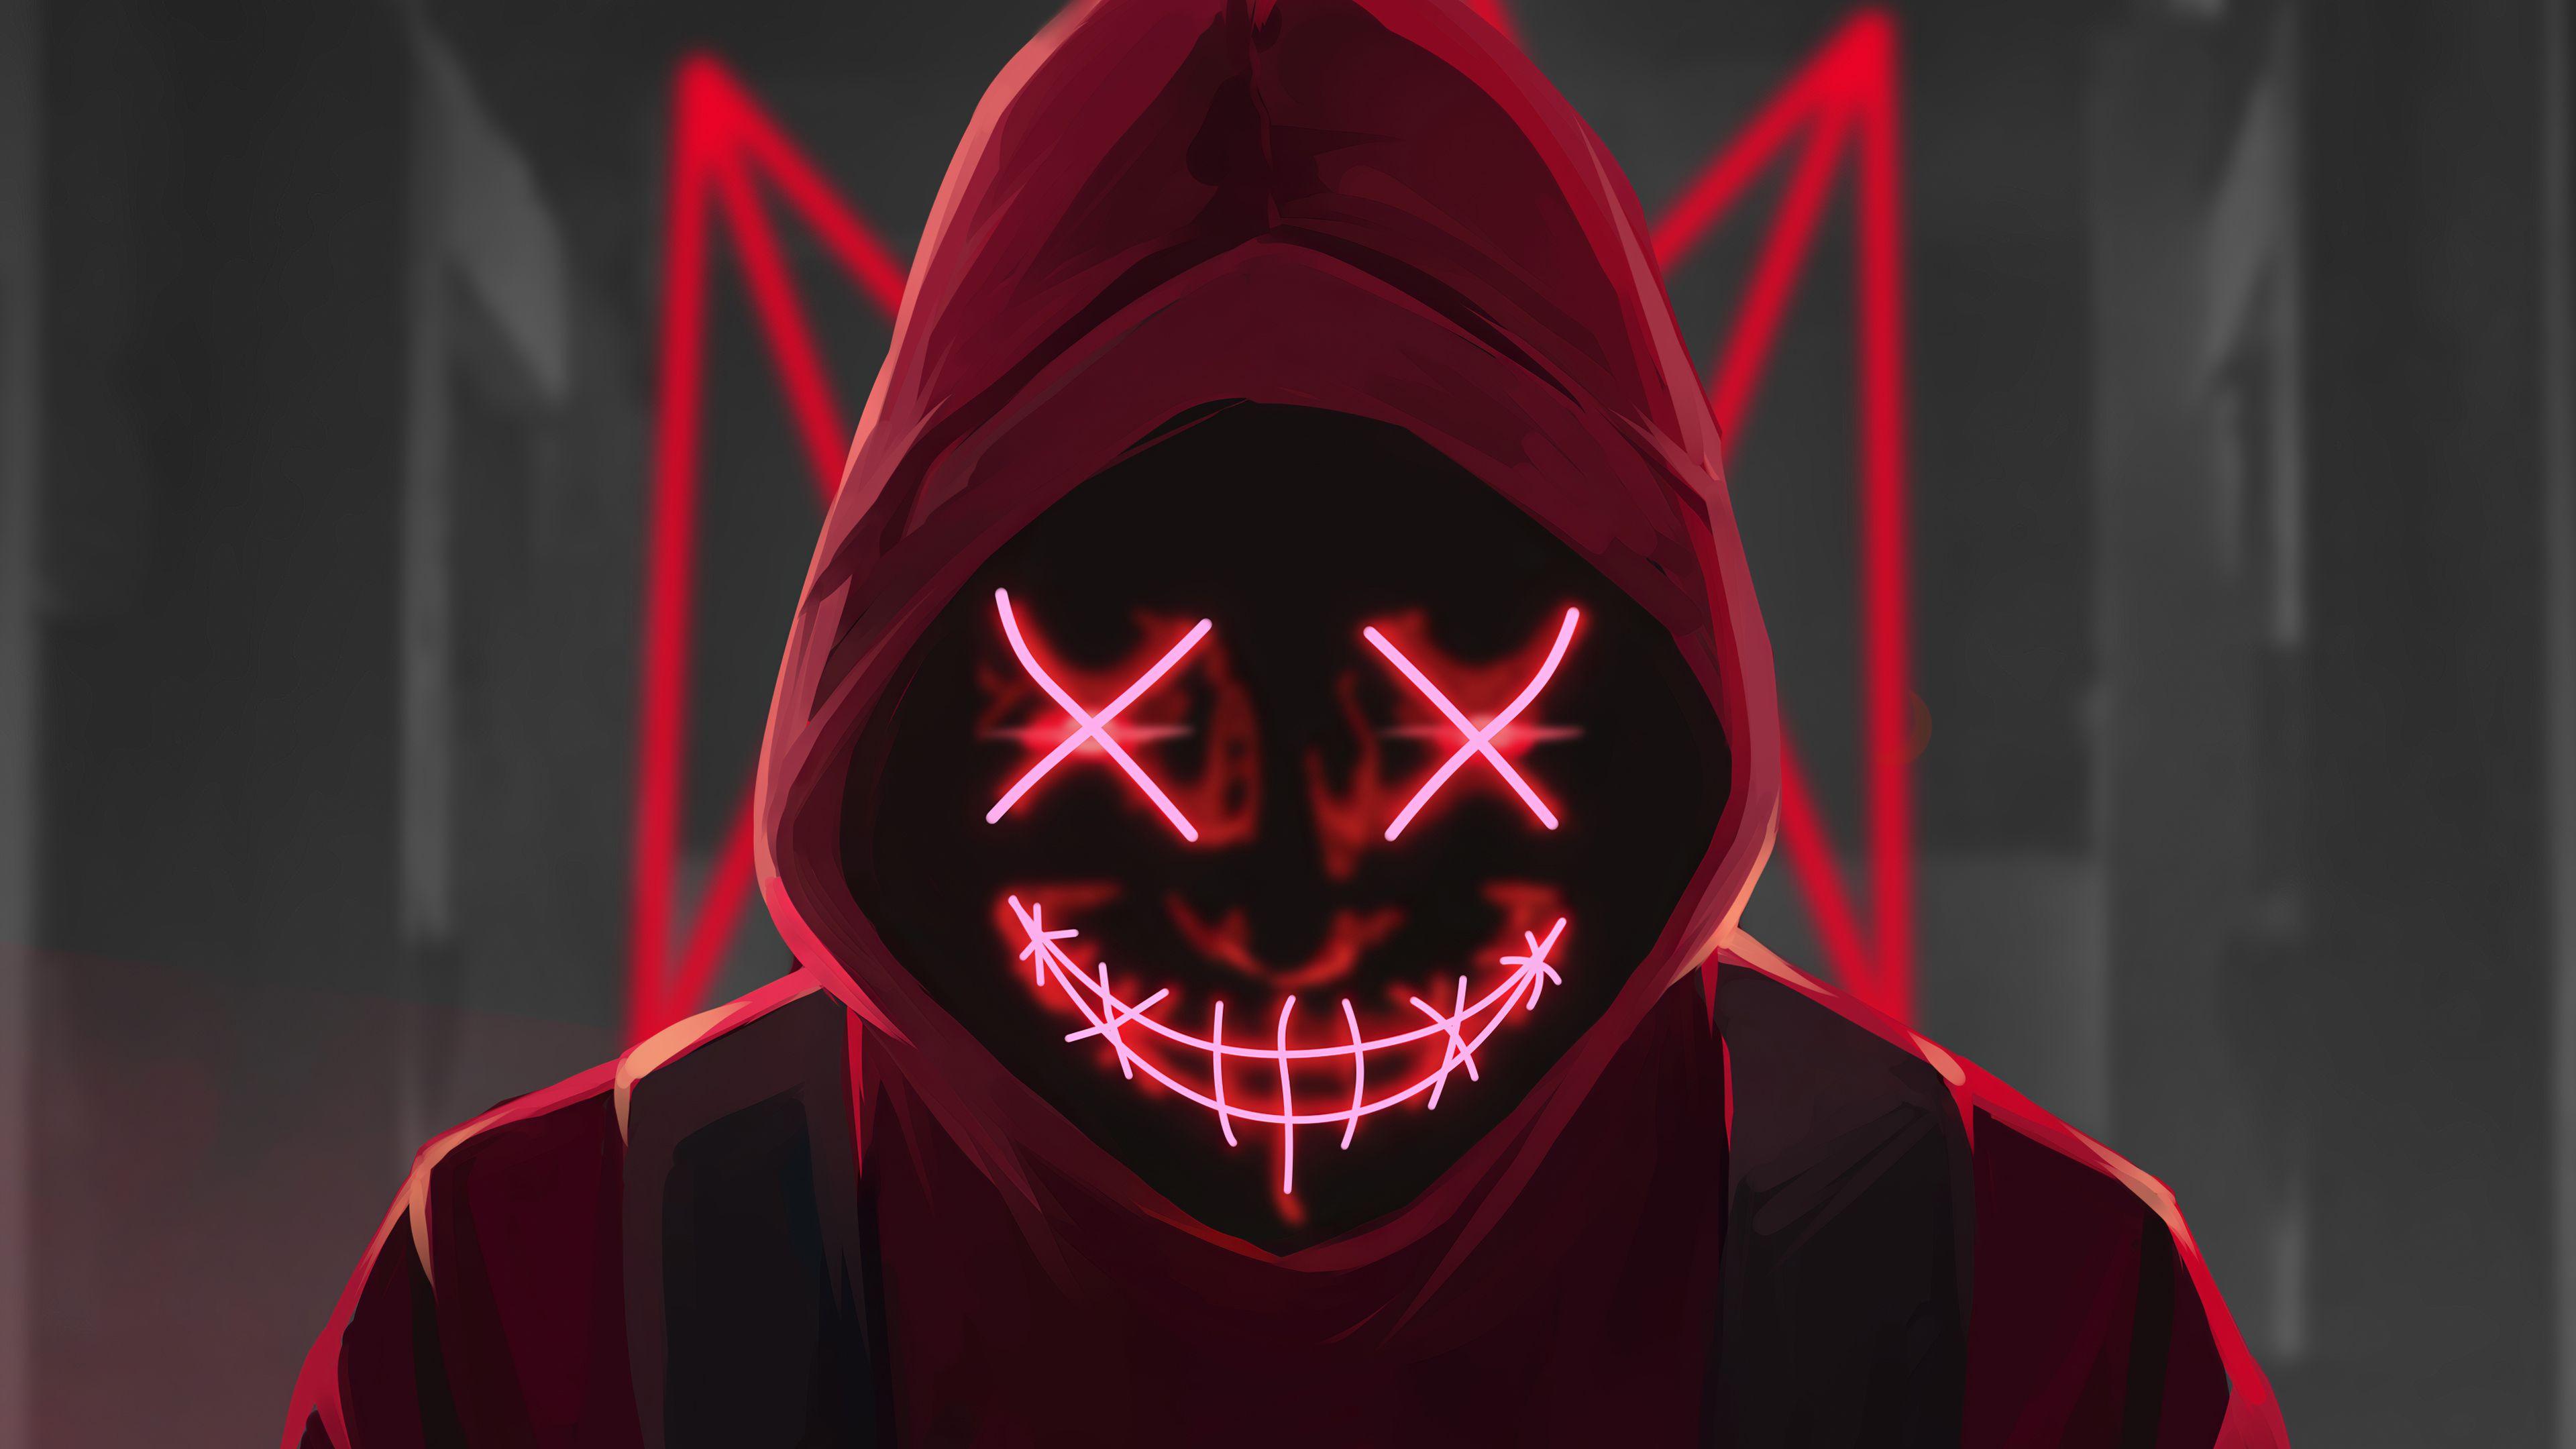 Red Mask Neon Eyes Neon Wallpaper Anime Wallpaper 1920x1080 Anime Wallpaper Anime wallpaper dark eyes